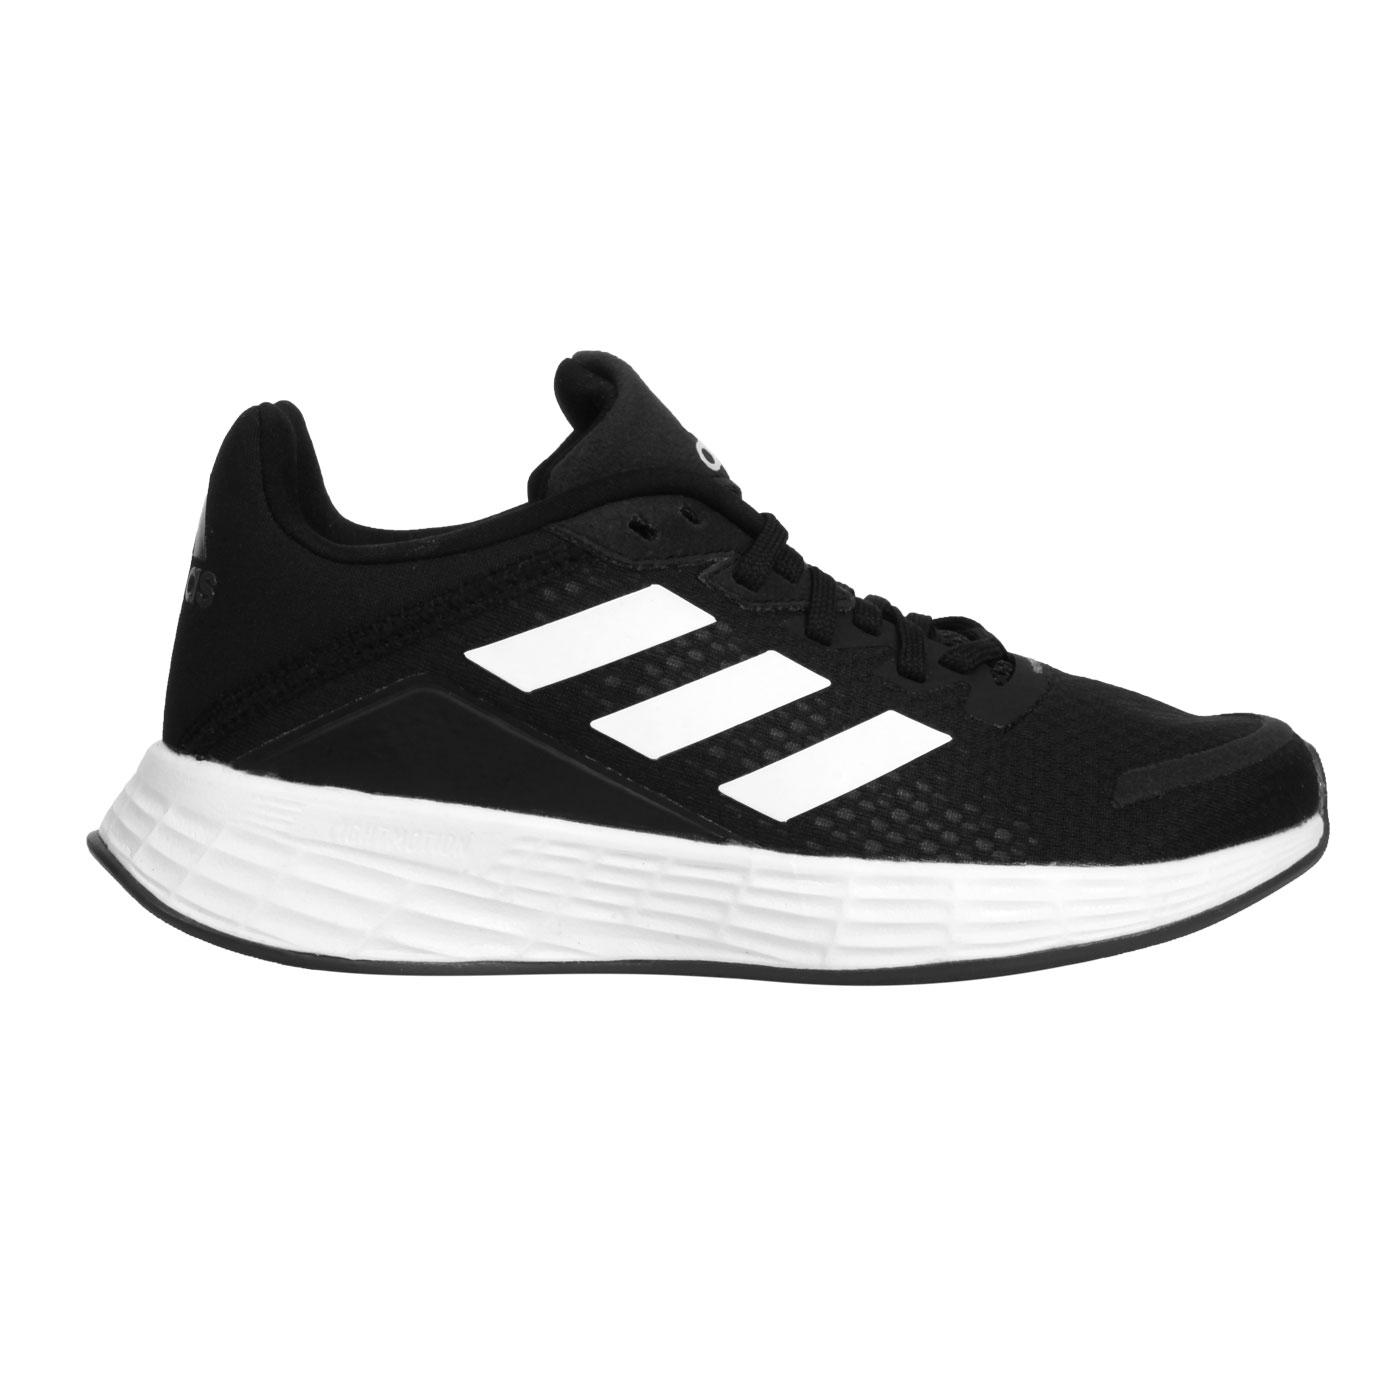 ADIDAS 大童慢跑鞋  @DURAMO SL K@FX7307 - 黑白